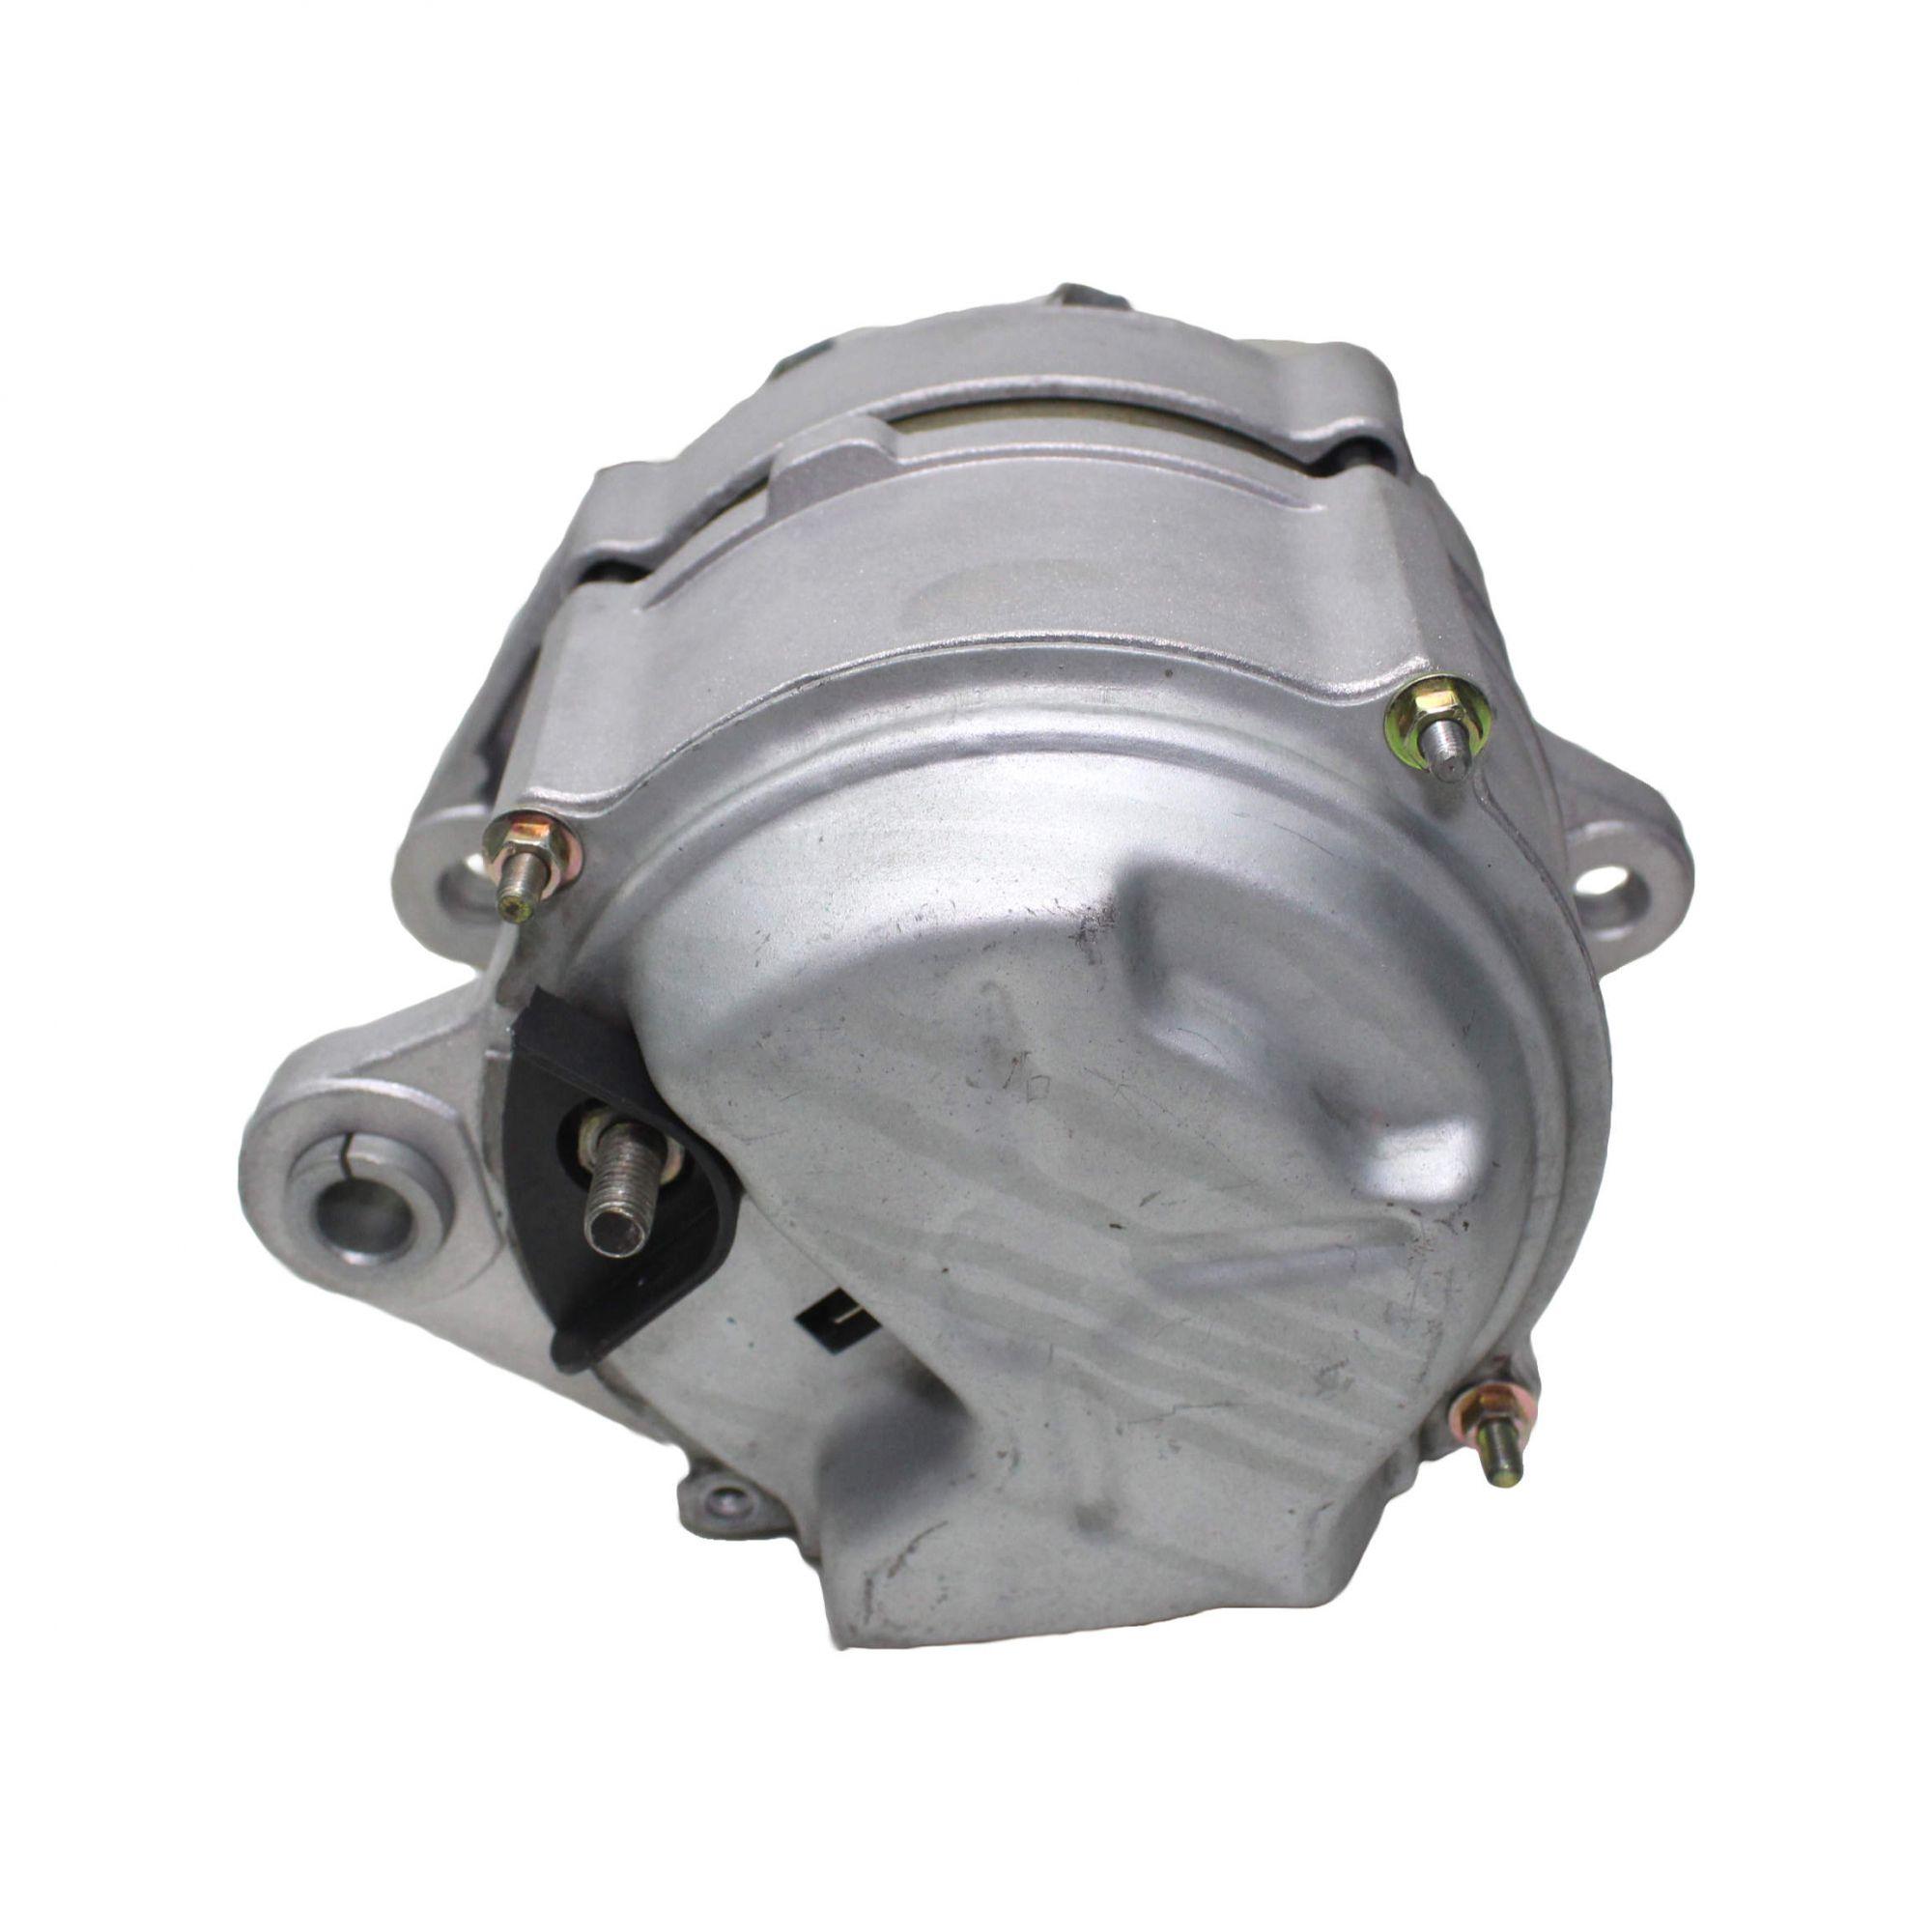 Alternador Bosch 90AH 5PK Fiat Tempra C/ Polia Afastada da Helice